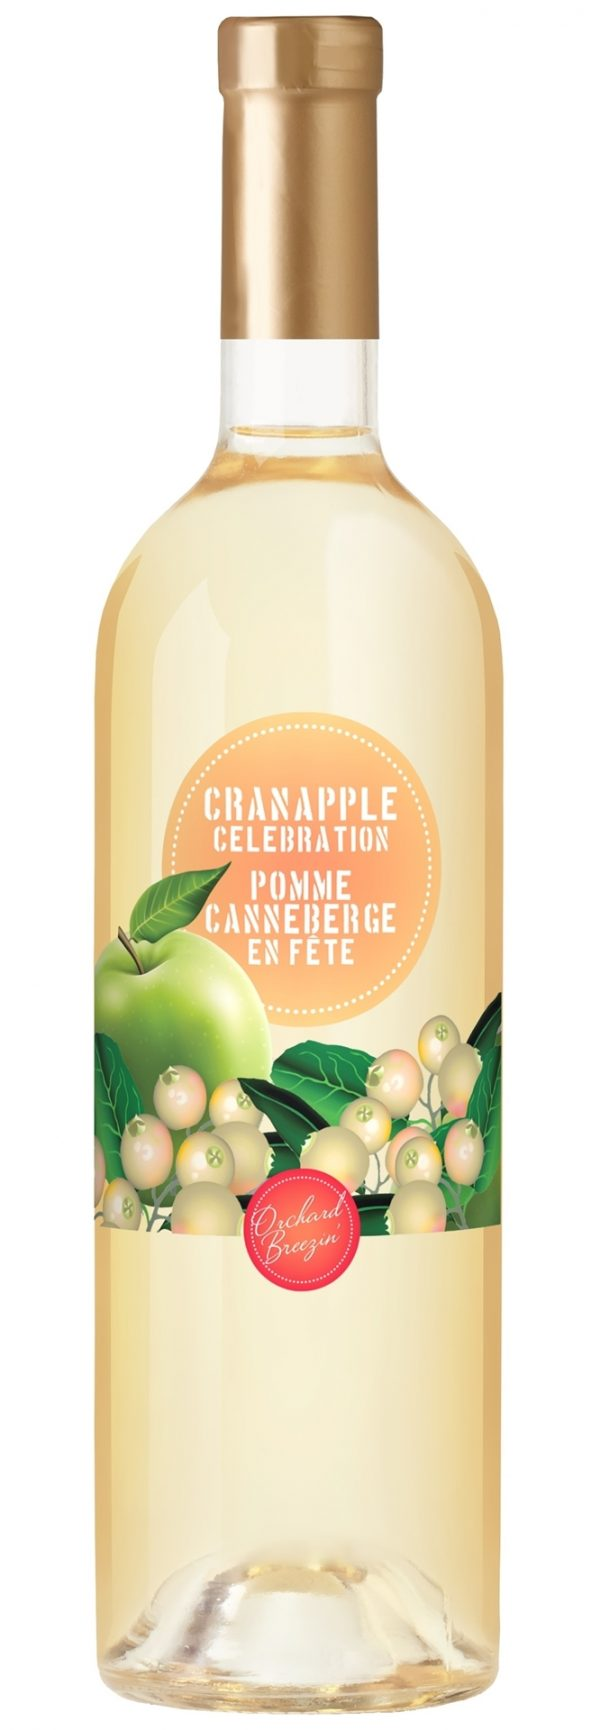 Cranapple Celebration - Orchard Breezin'-0